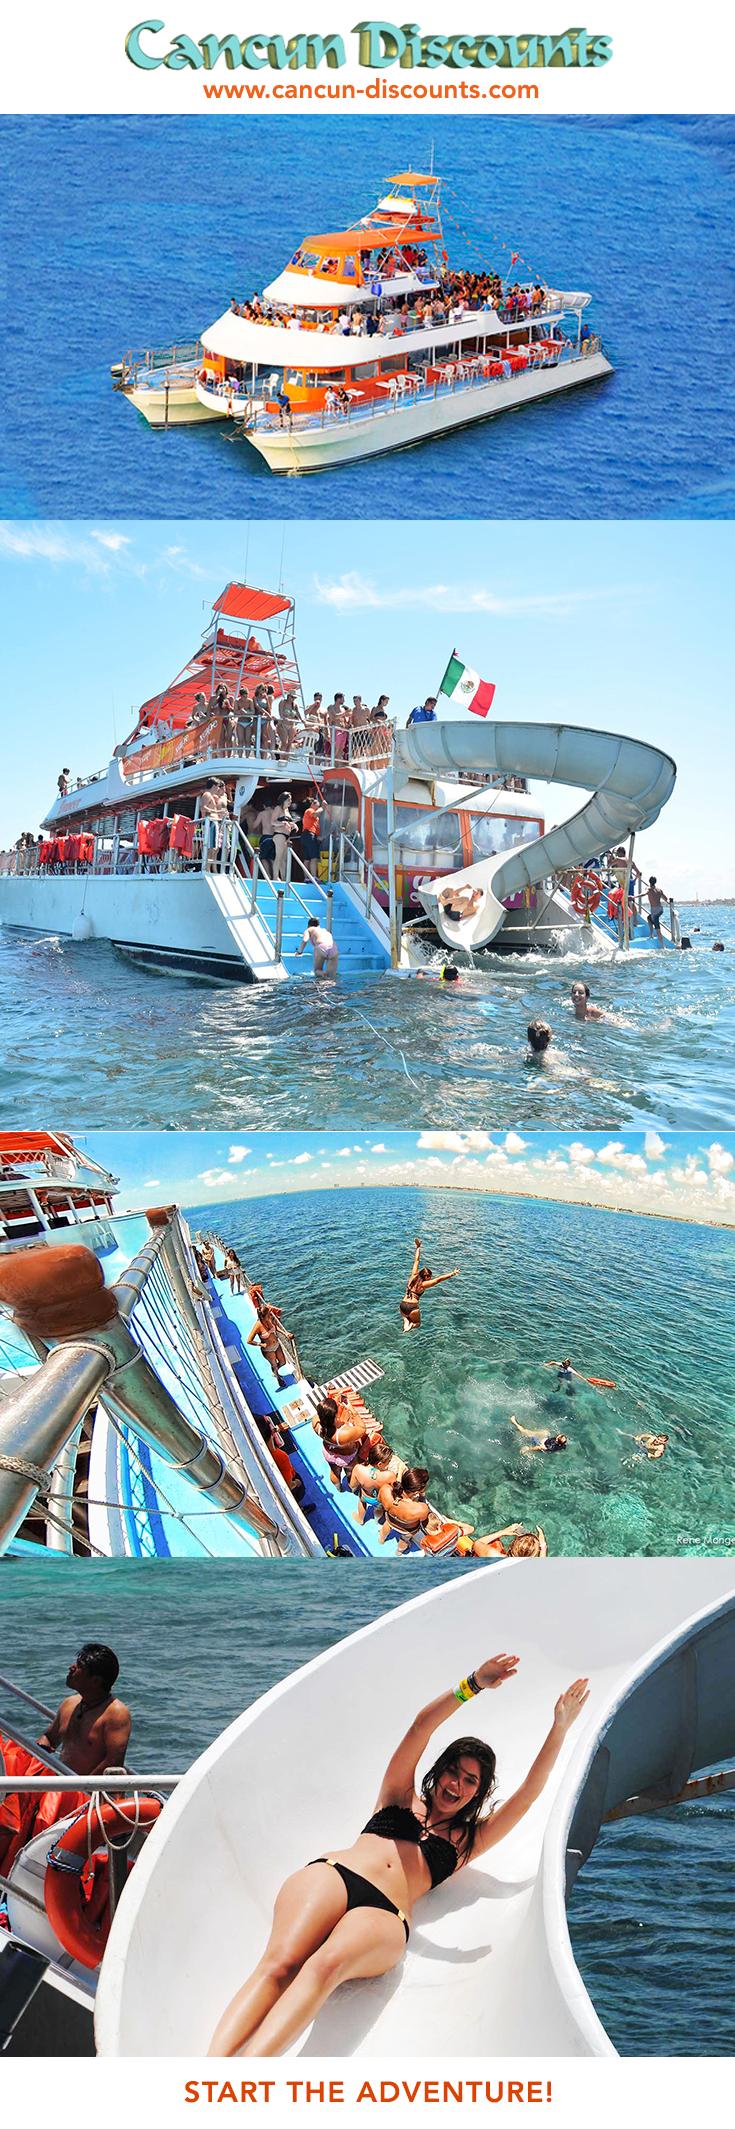 the triple decker dancer catamaran is the only isla mujeres tour rh pinterest com